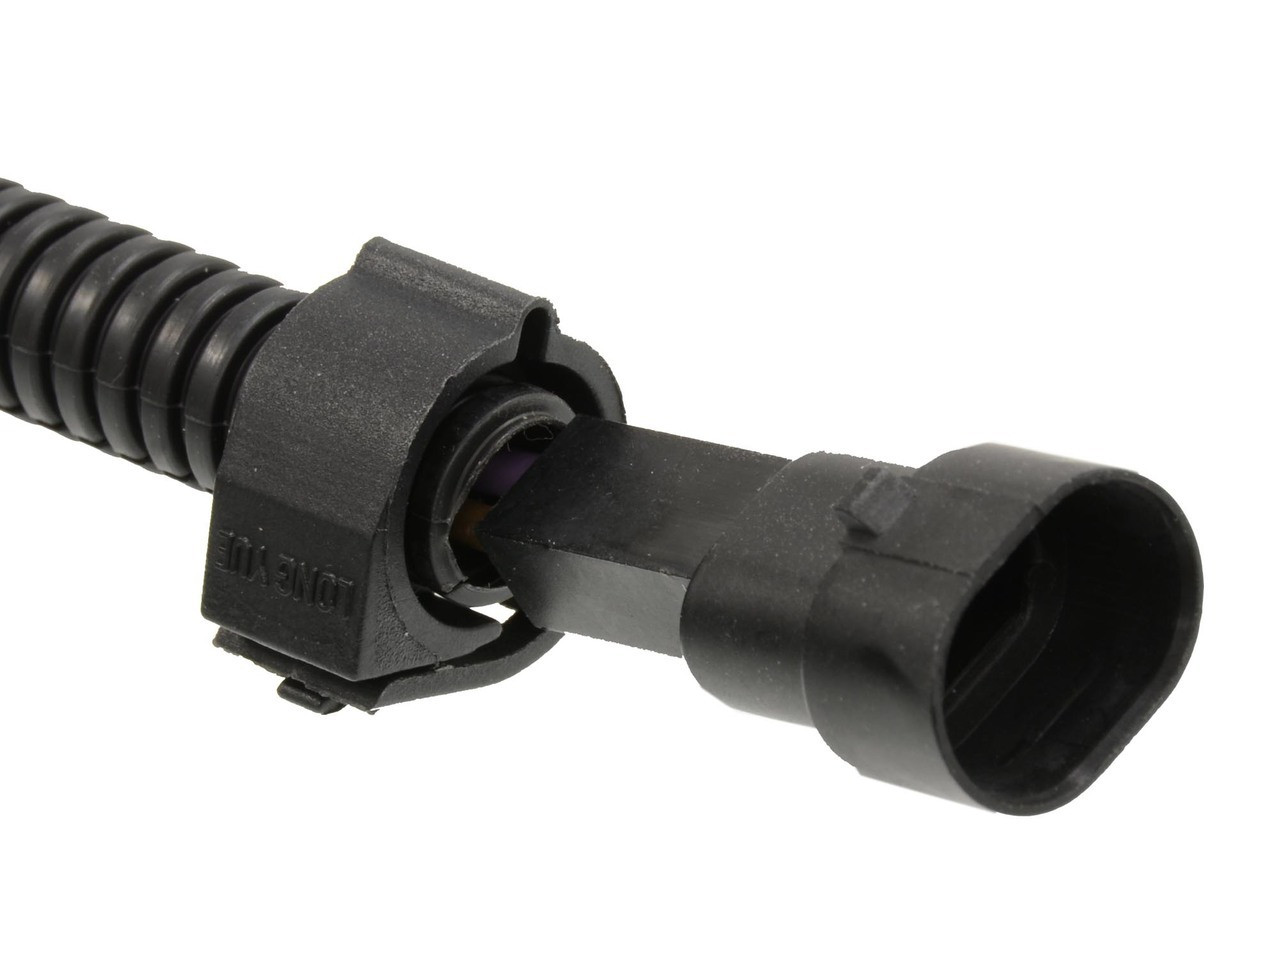 small resolution of intake air temp iat mat sensor wire harness extension 22 fits gm ls1 lt1